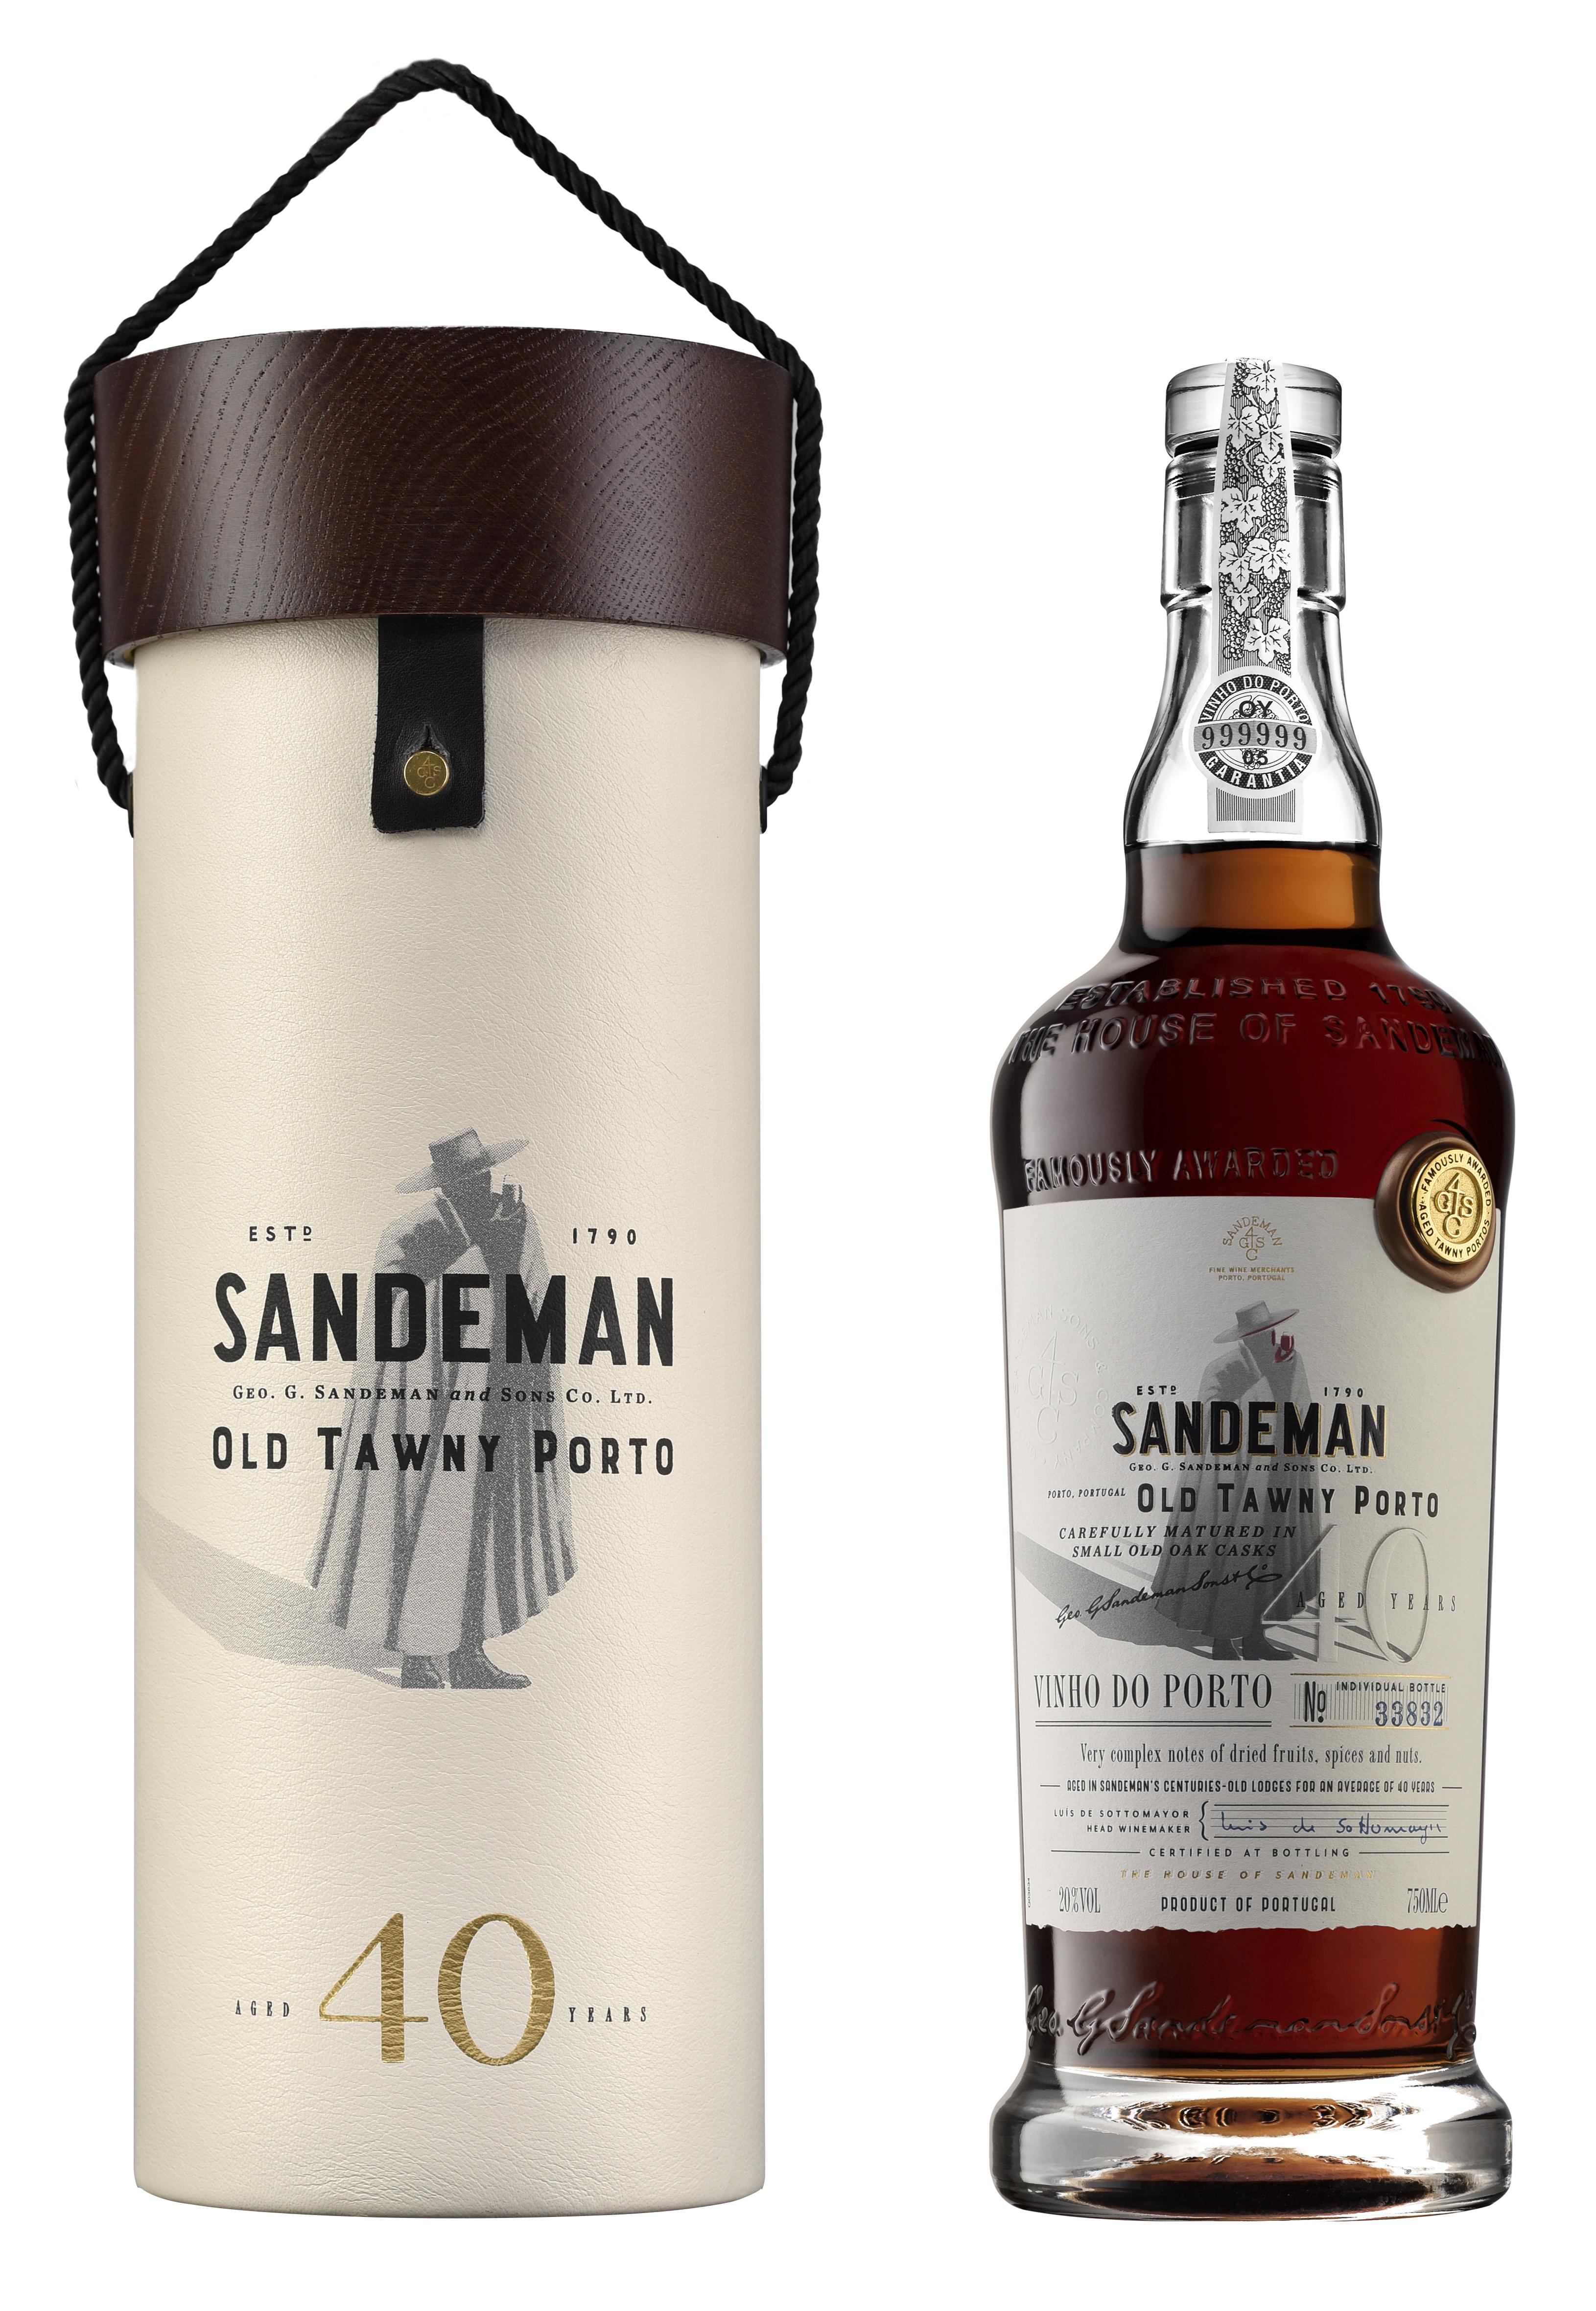 Sandeman, 40 Year Old Tawny Port NV